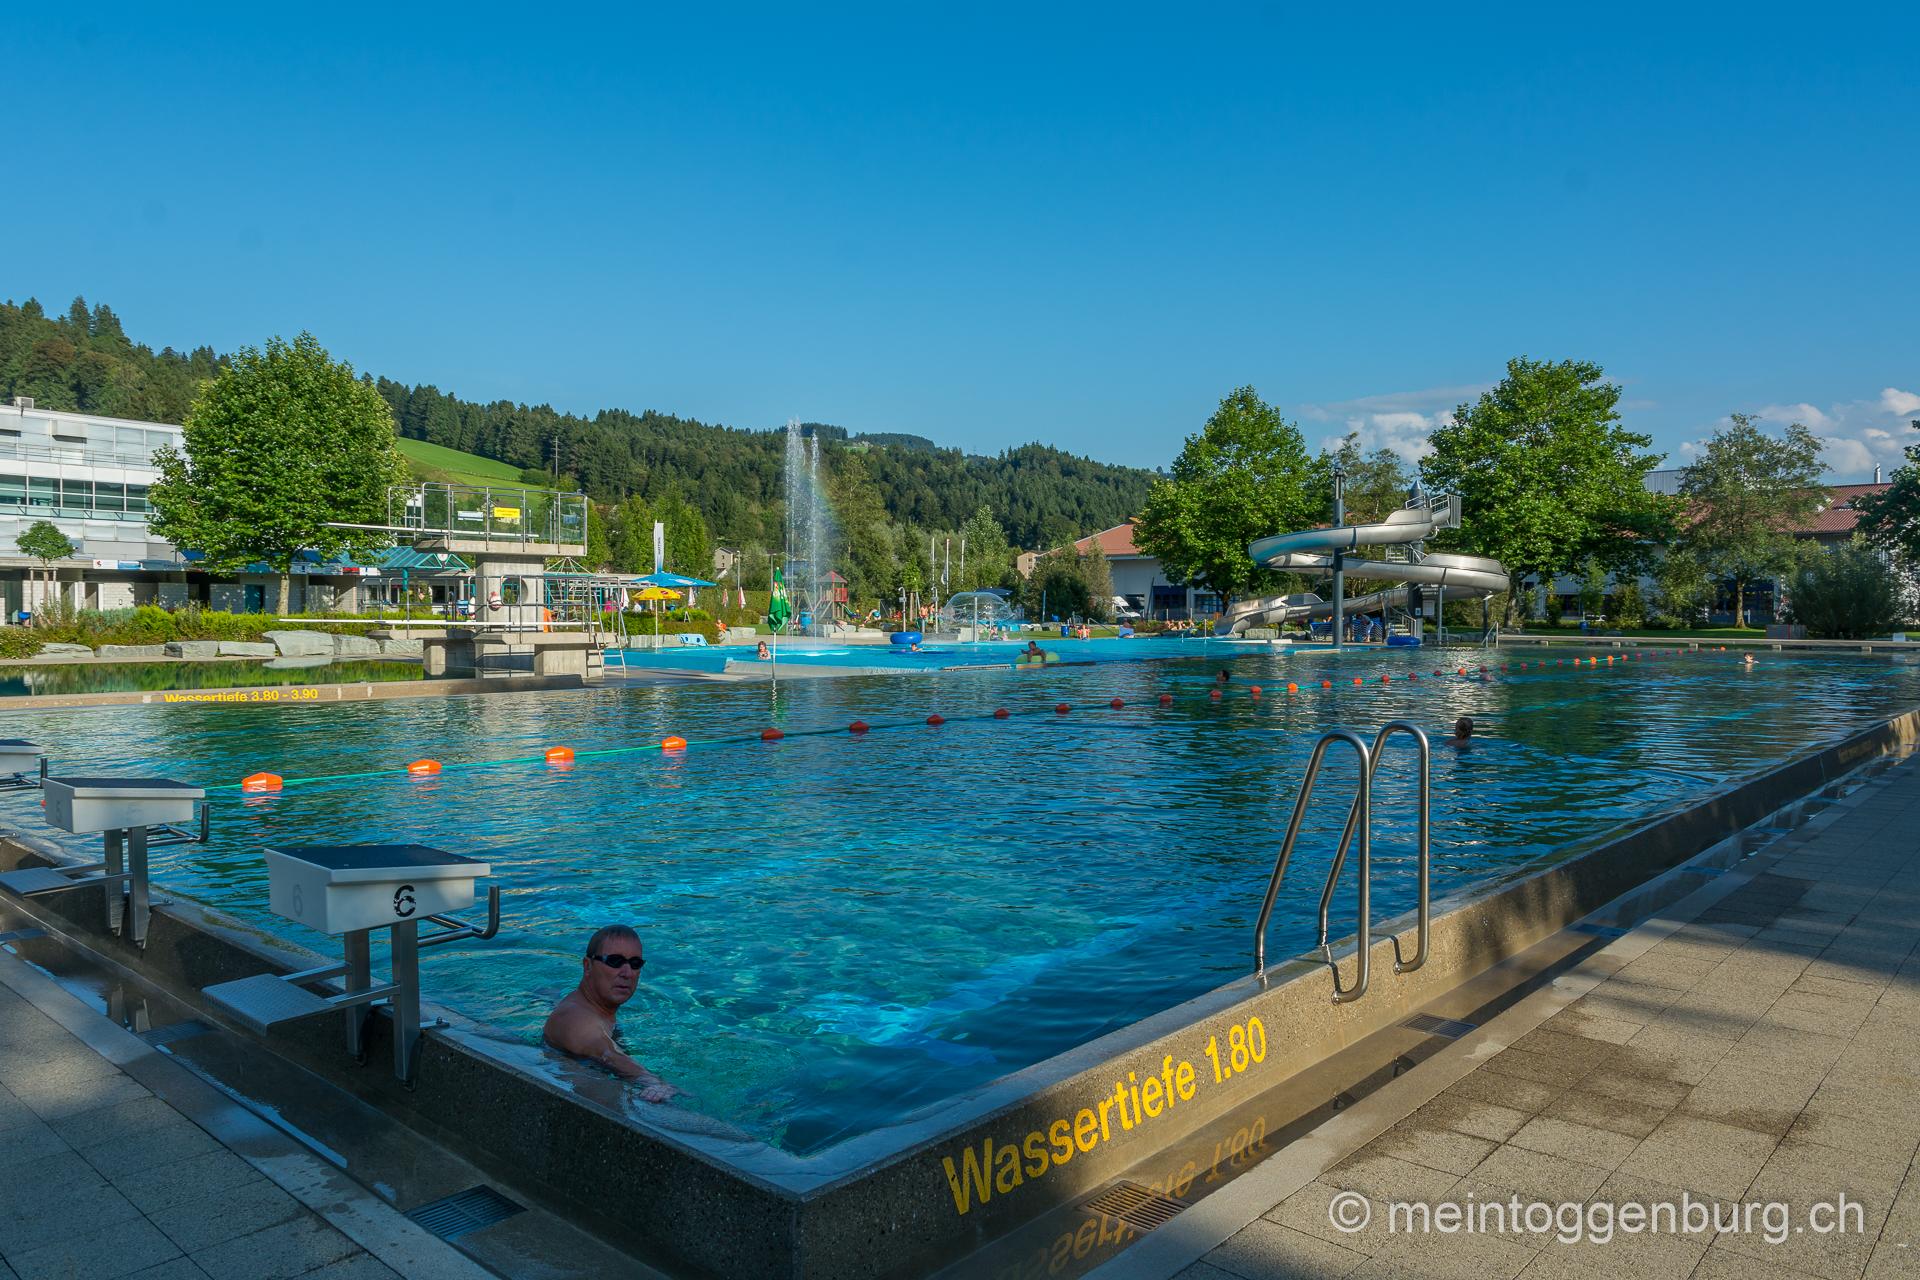 Badi Wattwil / Freibad Wattwil